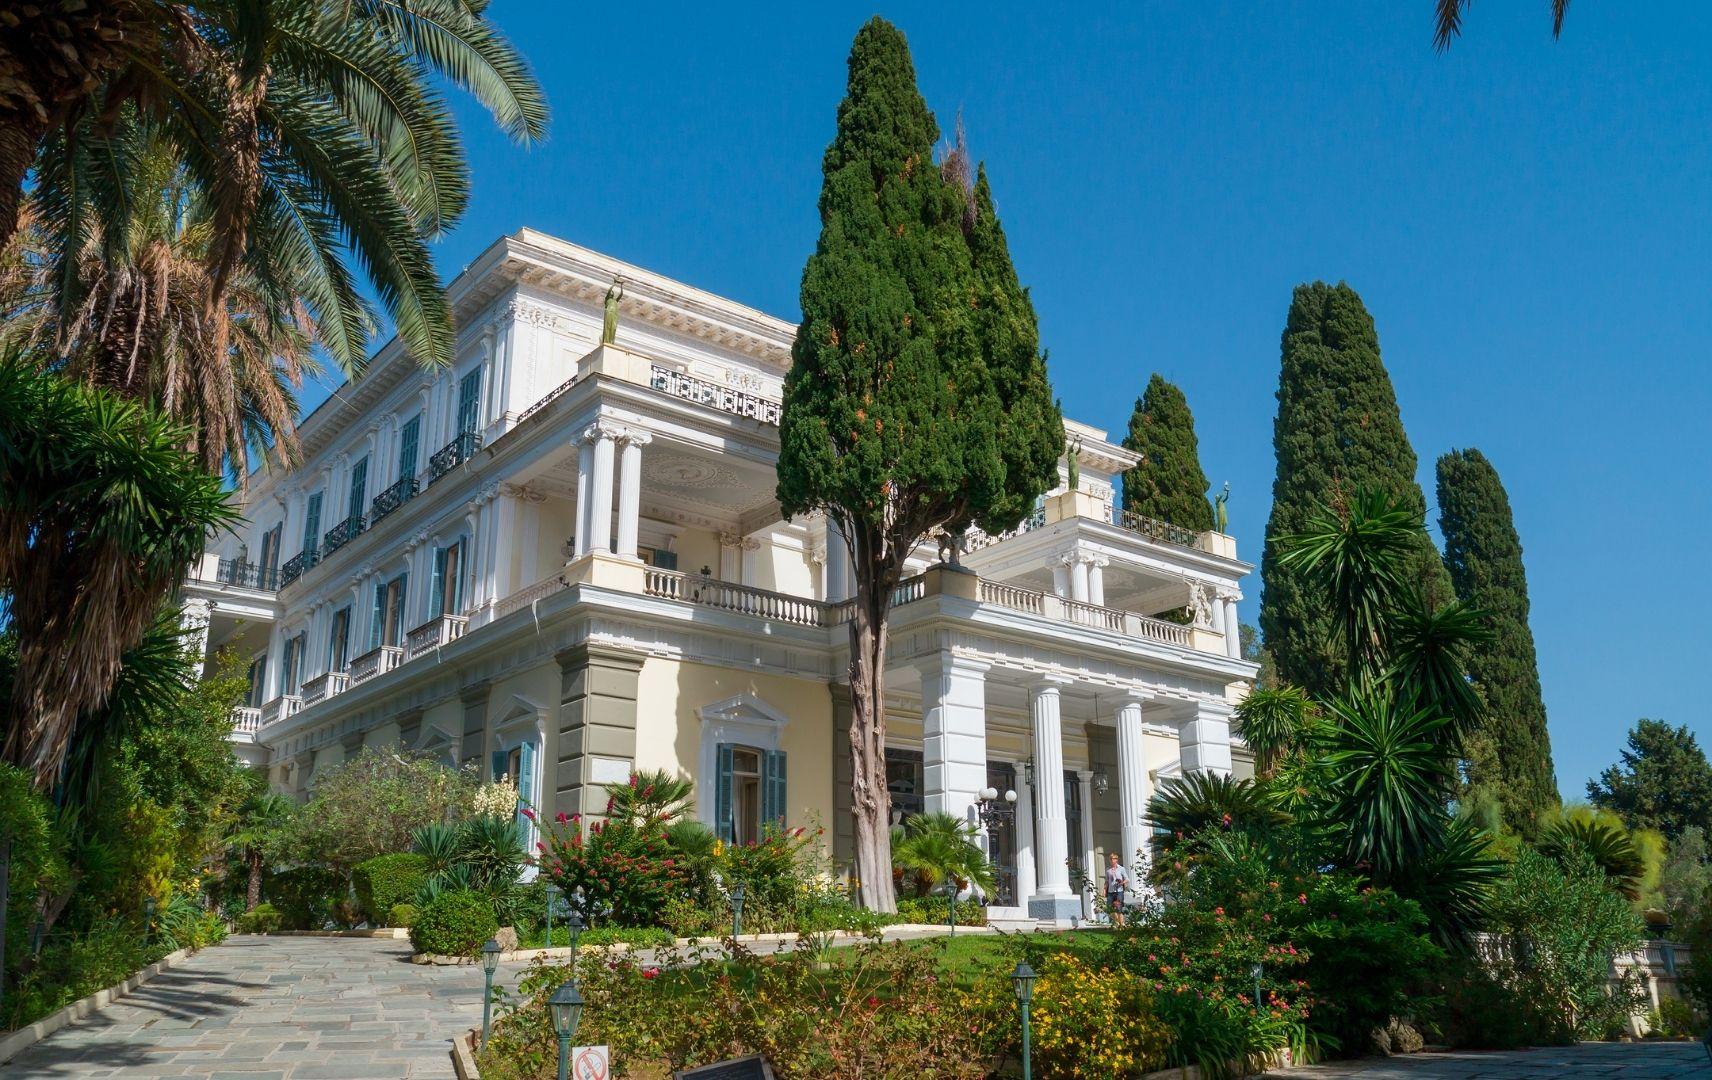 Reiseziel Korfu - Ferienhaus Achillion